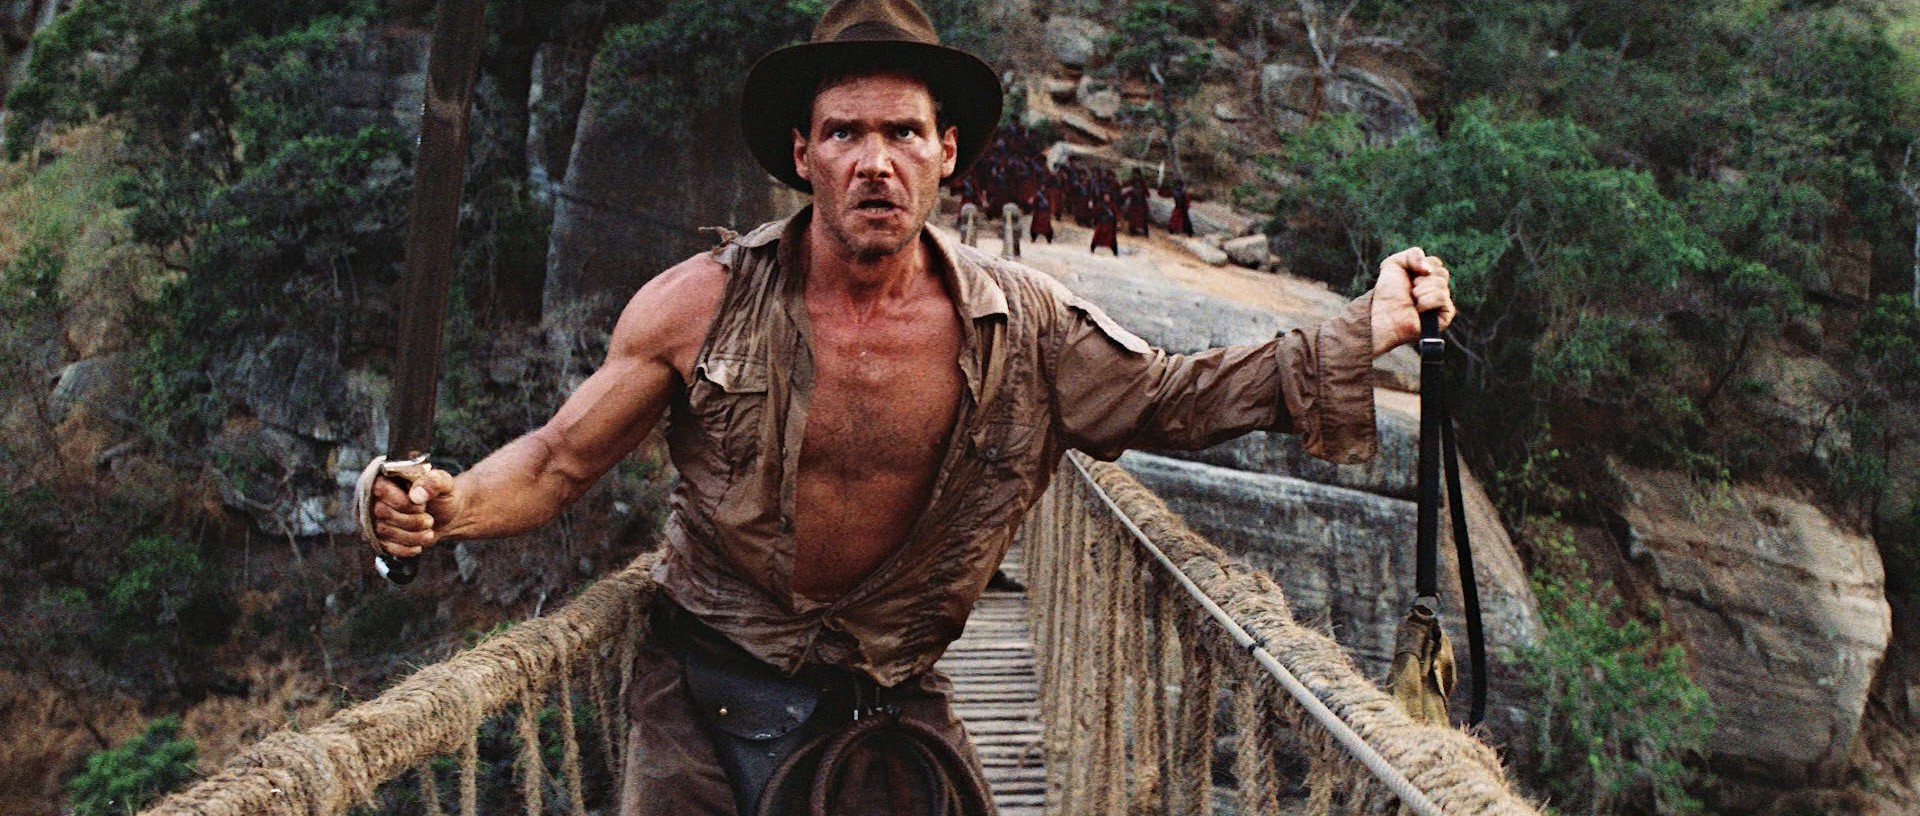 Indiana Jones Backgrounds, Compatible - PC, Mobile, Gadgets  1920x816 px